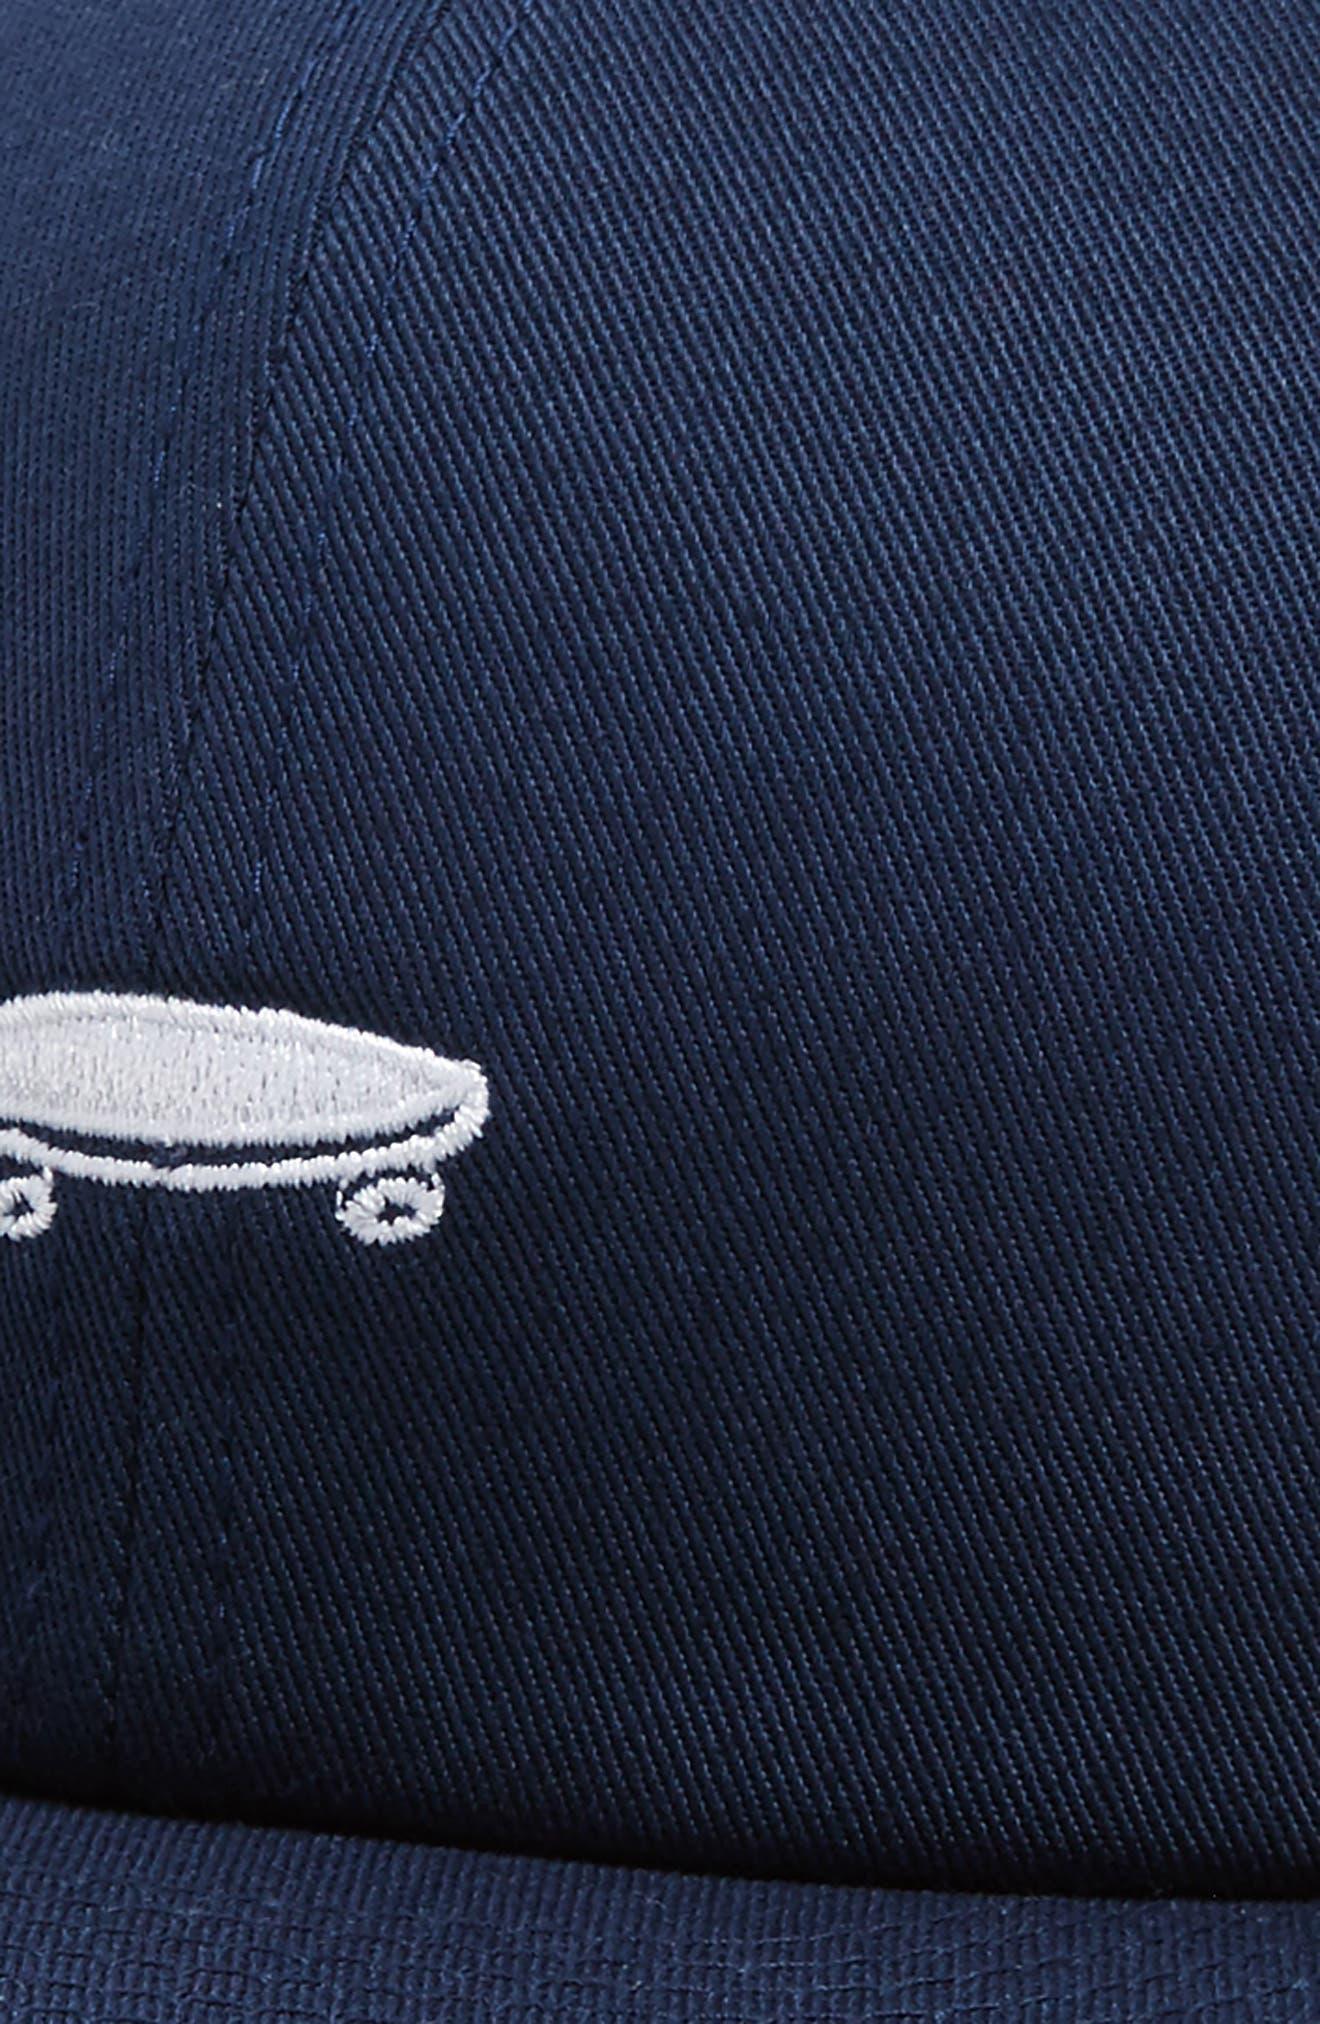 Alternate Image 3  - Vans Salton II Ball Cap